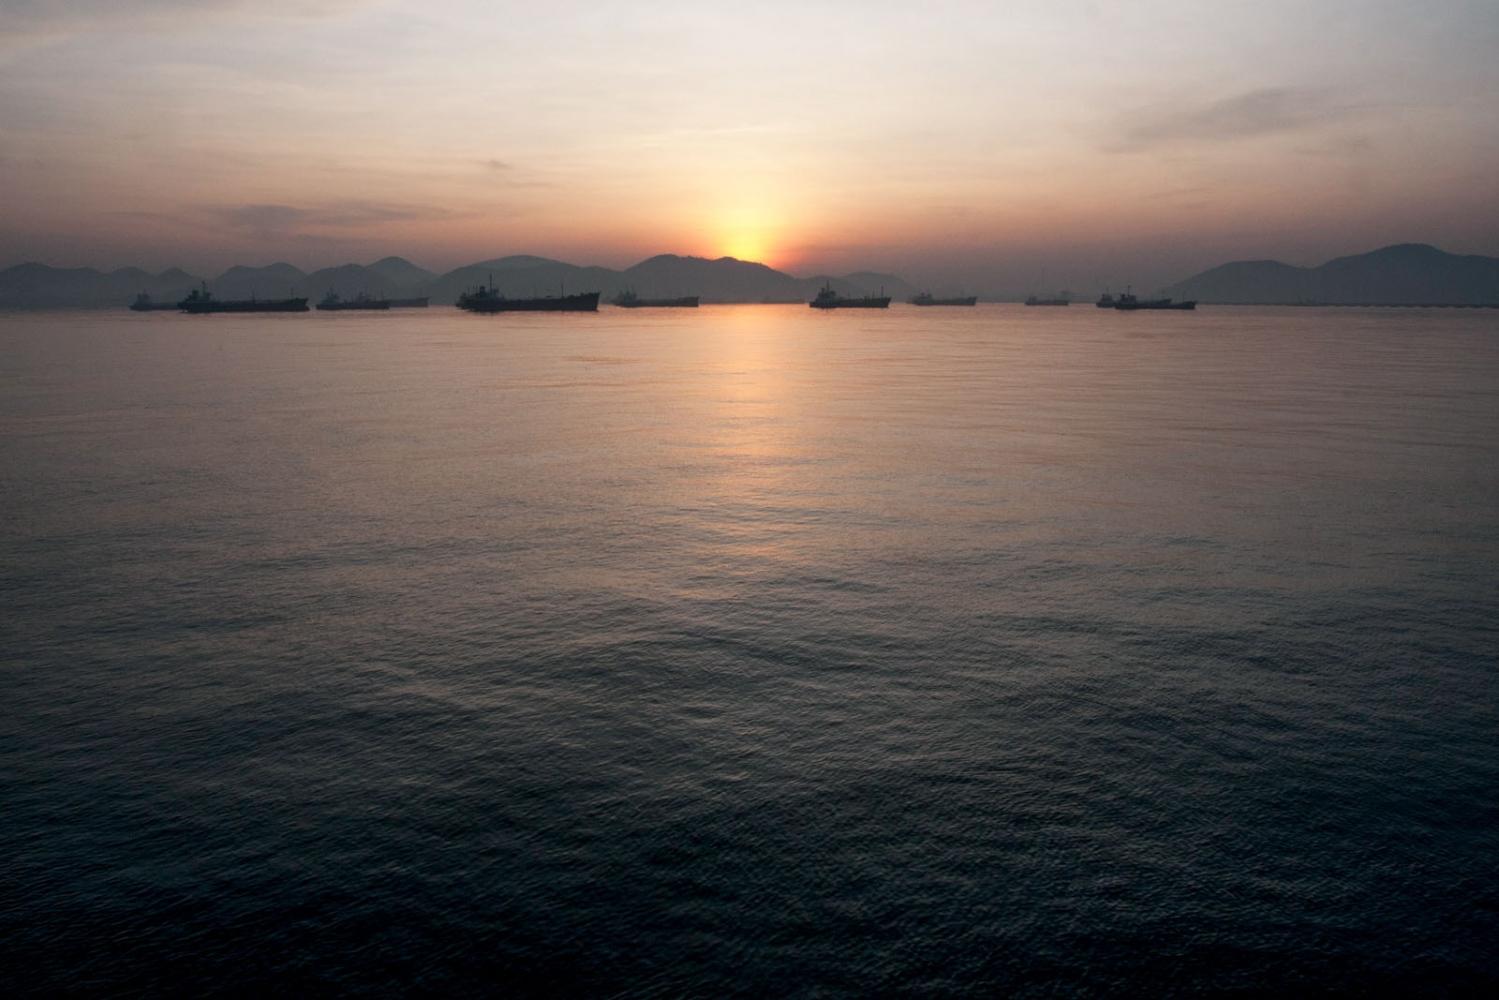 The Gulf of Thailand at dawn off the coast of Chonburi Province. Chonburi, Thailand